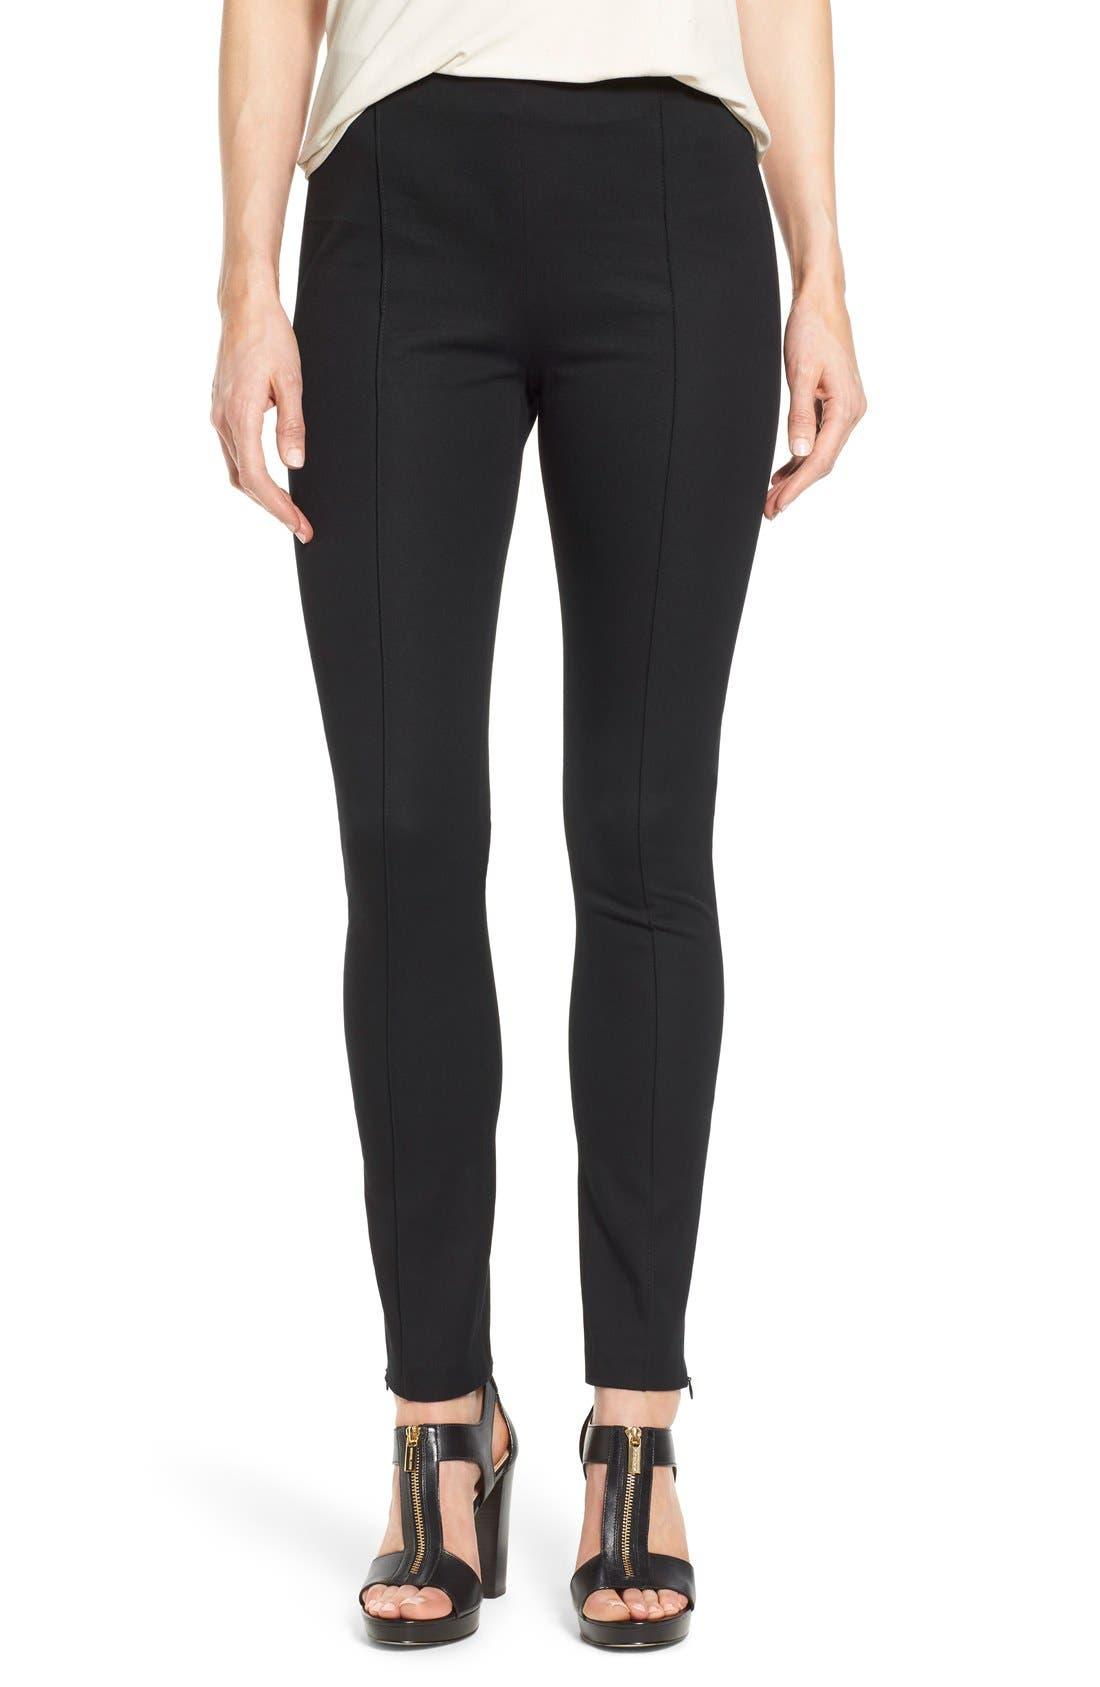 Alternate Image 1 Selected - MICHAEL Michael Kors 'Hutton' Ankle Zip Slim Pintuck Pants (Petite)